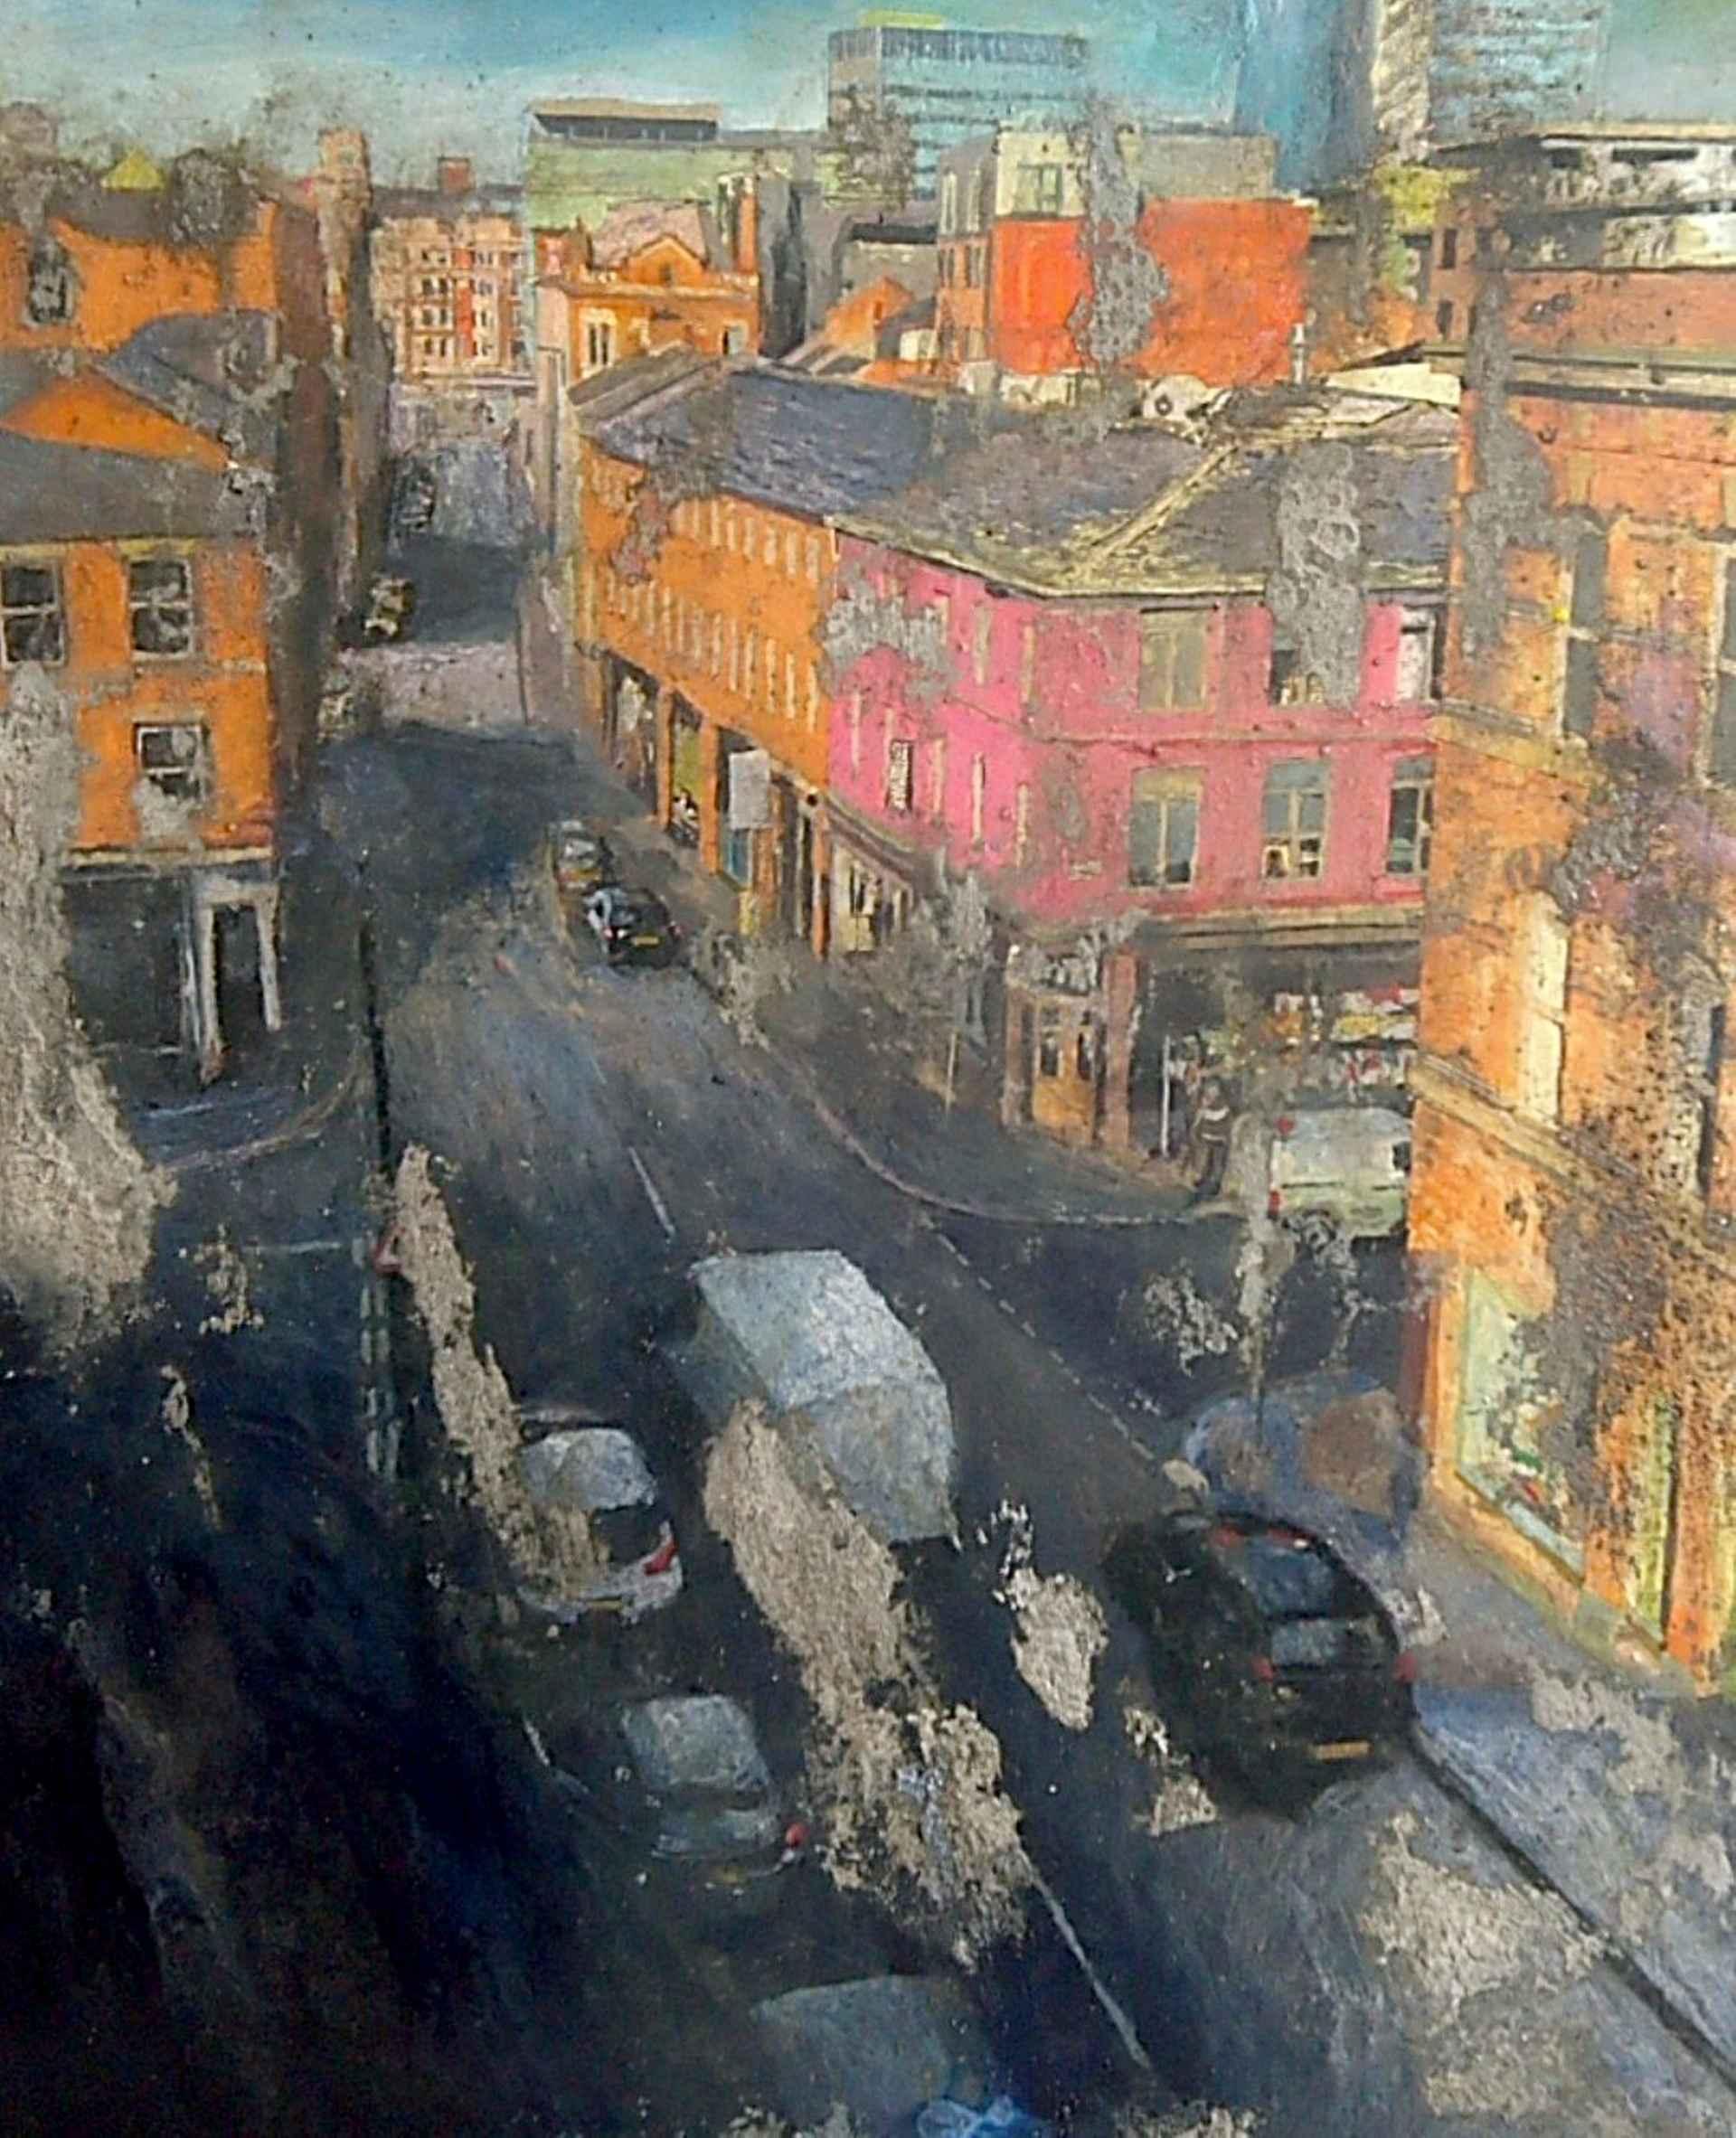 Thomas Street by Tim Garner